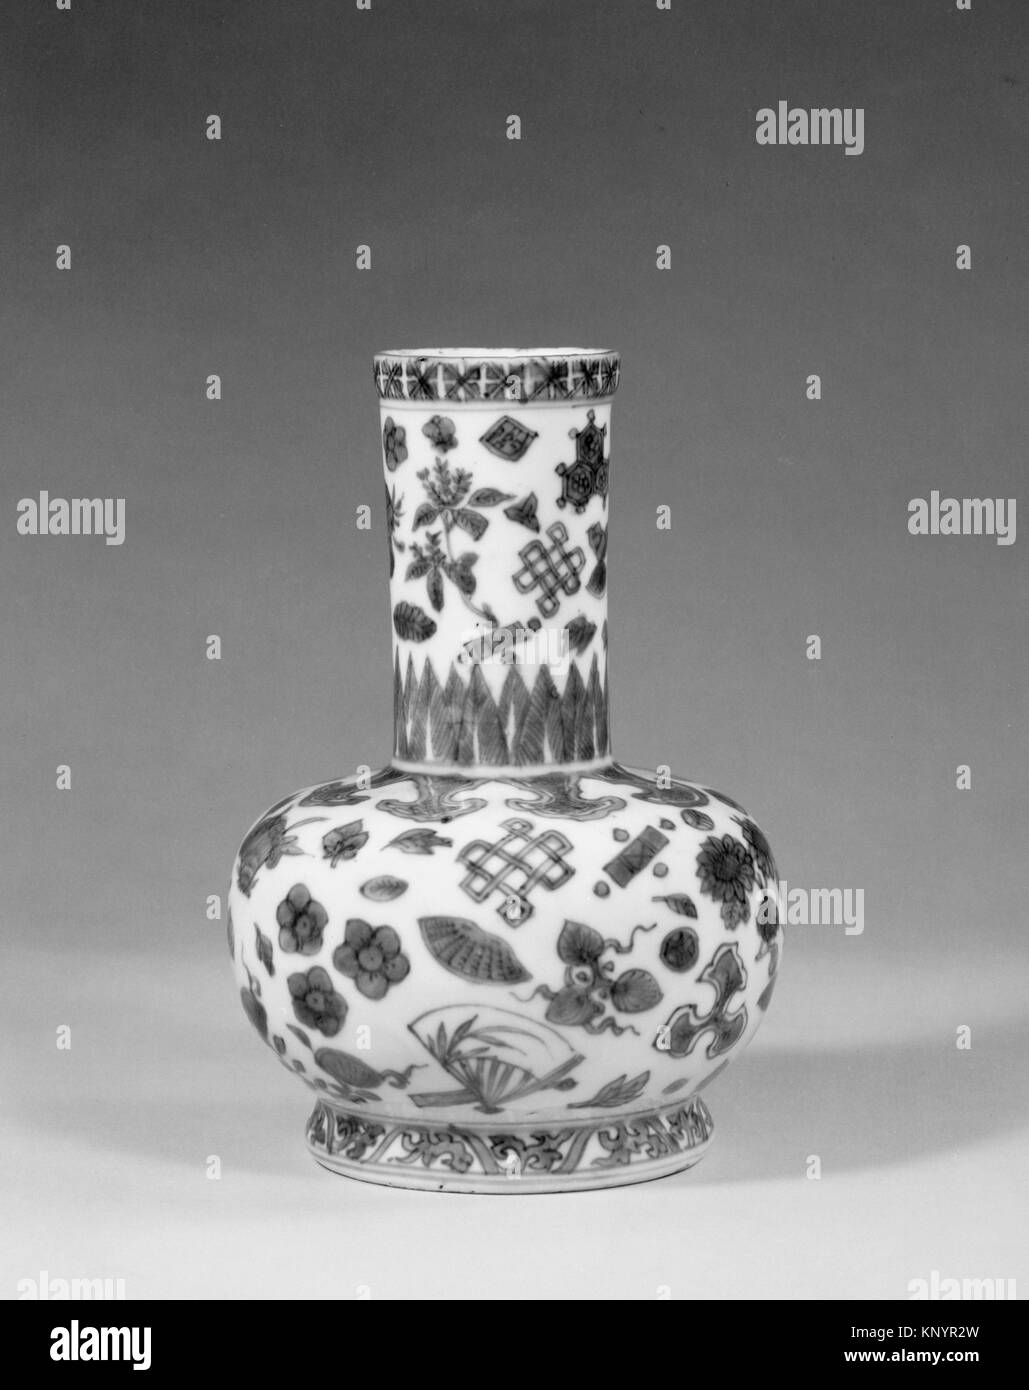 Ming dynasty vase stock photos ming dynasty vase stock images vase period ming dynasty 1368 1644 date before 1645 reviewsmspy